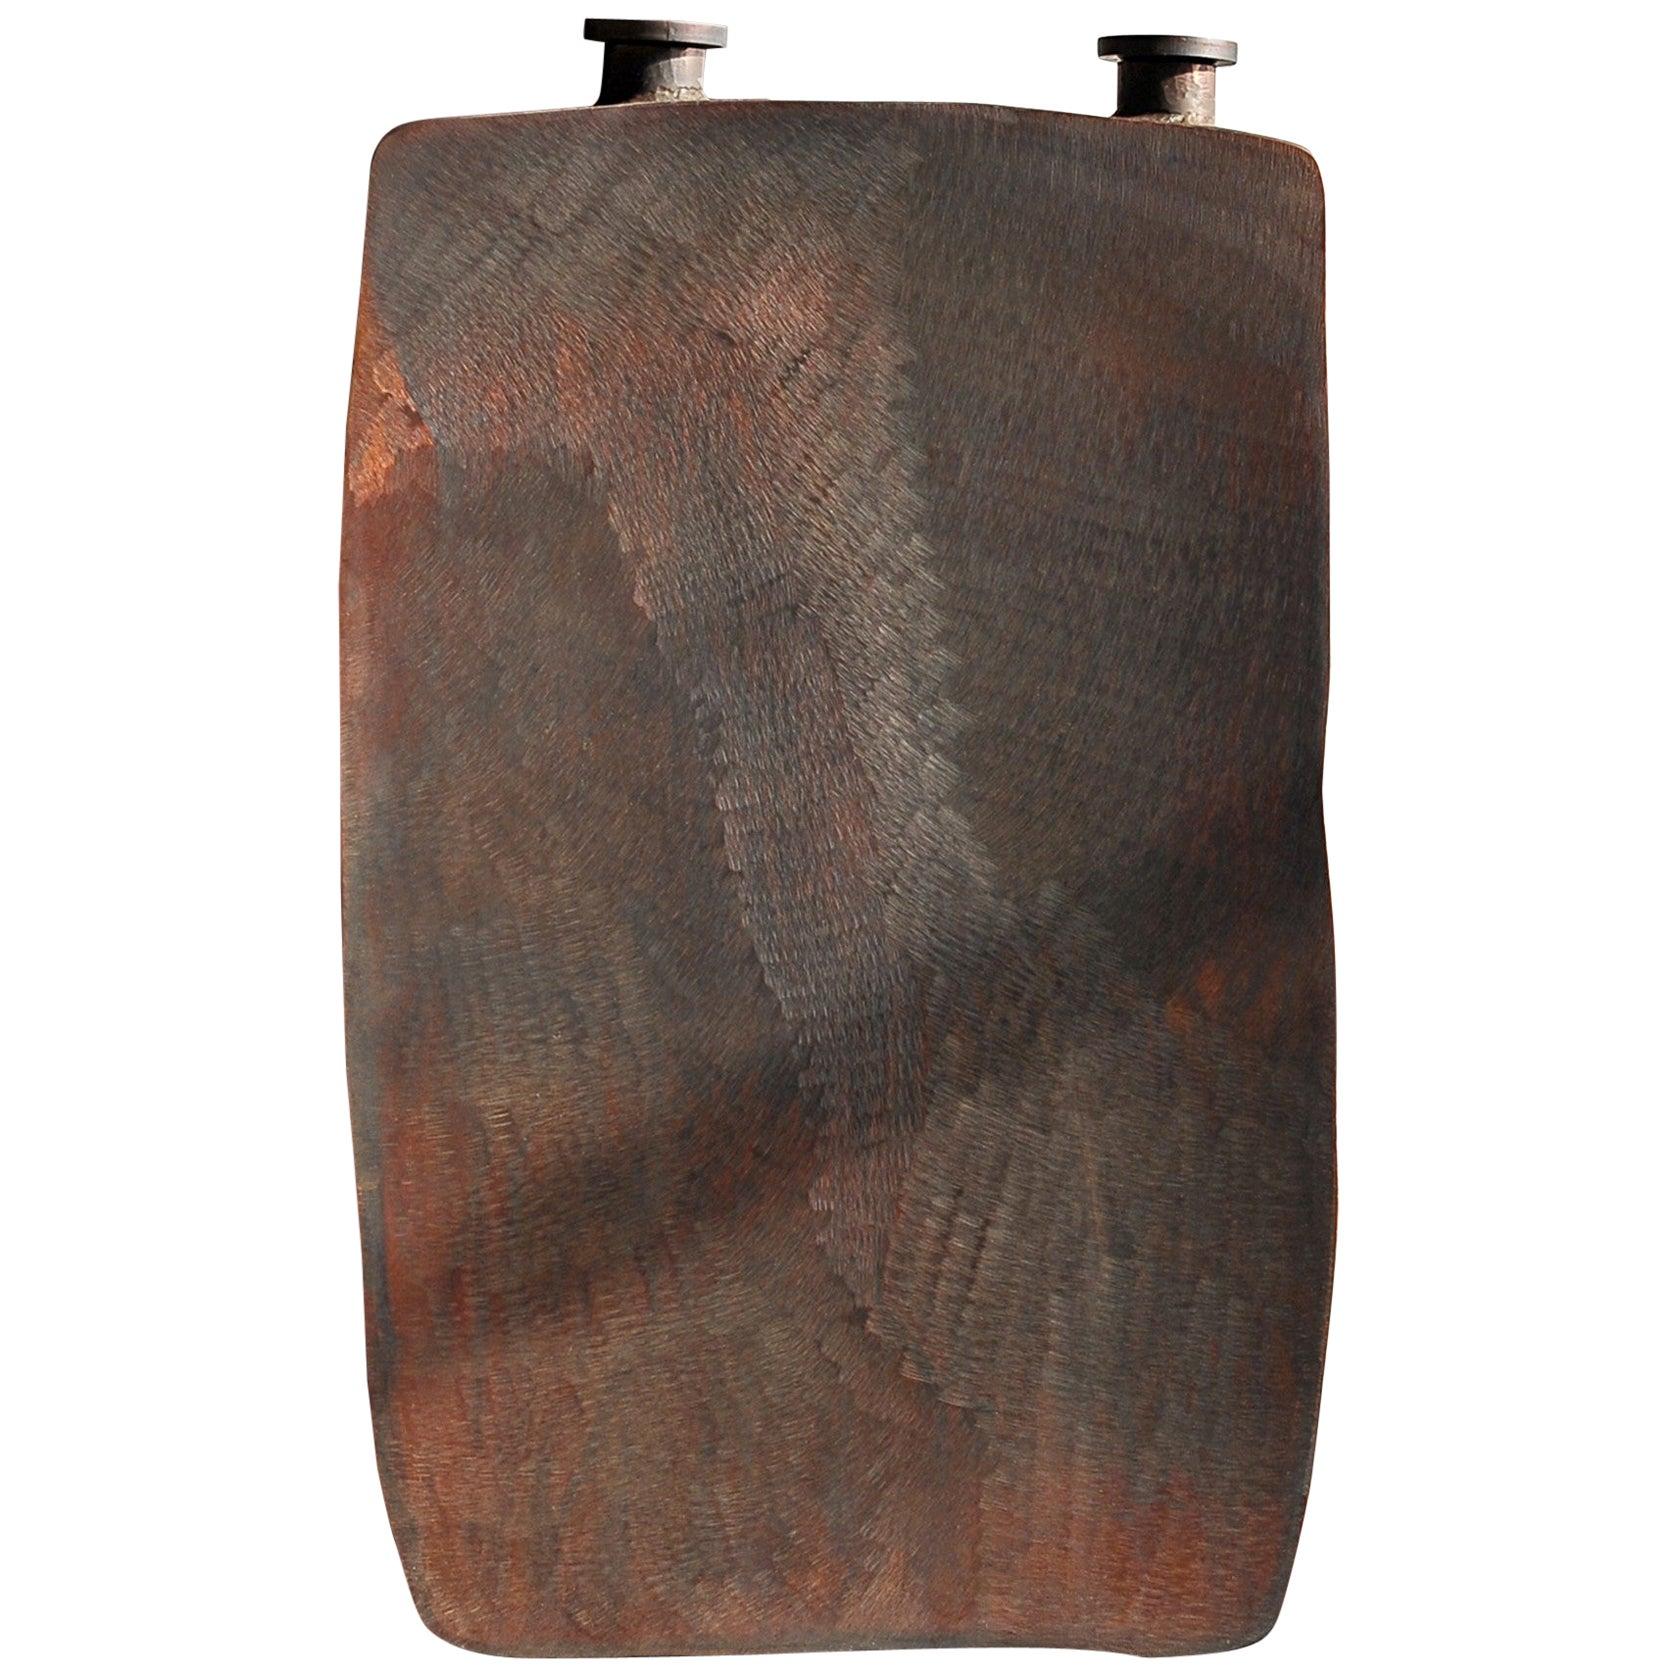 Medium Steel Brown Bottle by Lukasz Friedrich